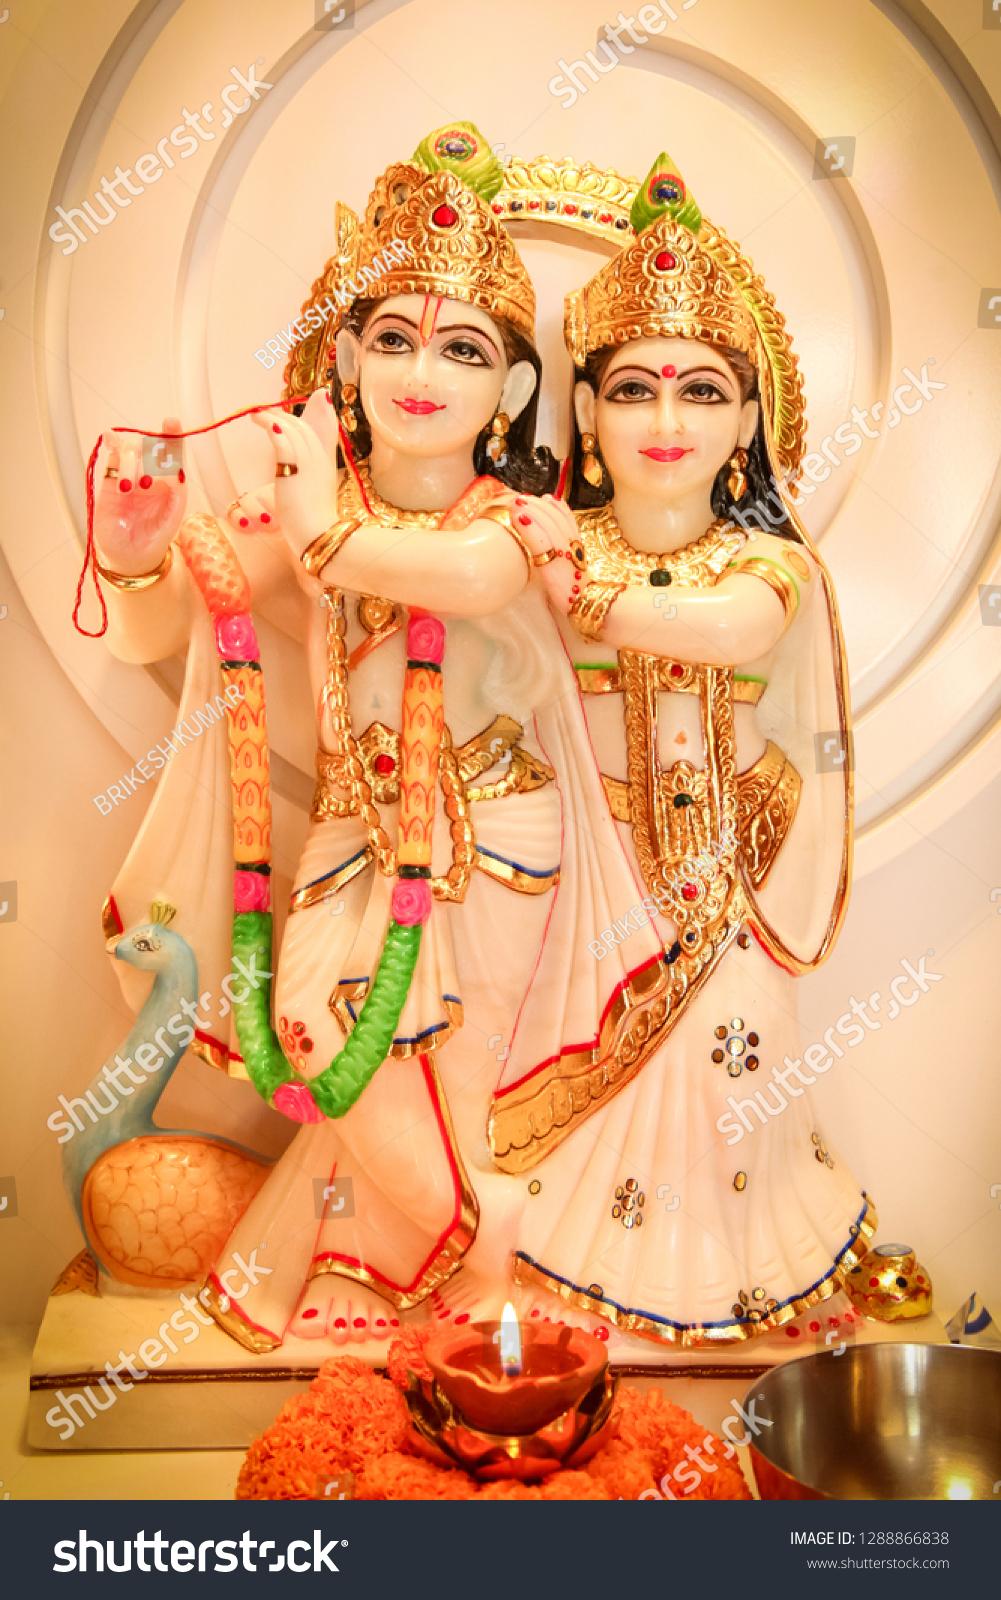 Radha Krishna Hd Wallpaper Stock Photo Edit Now 1288866838